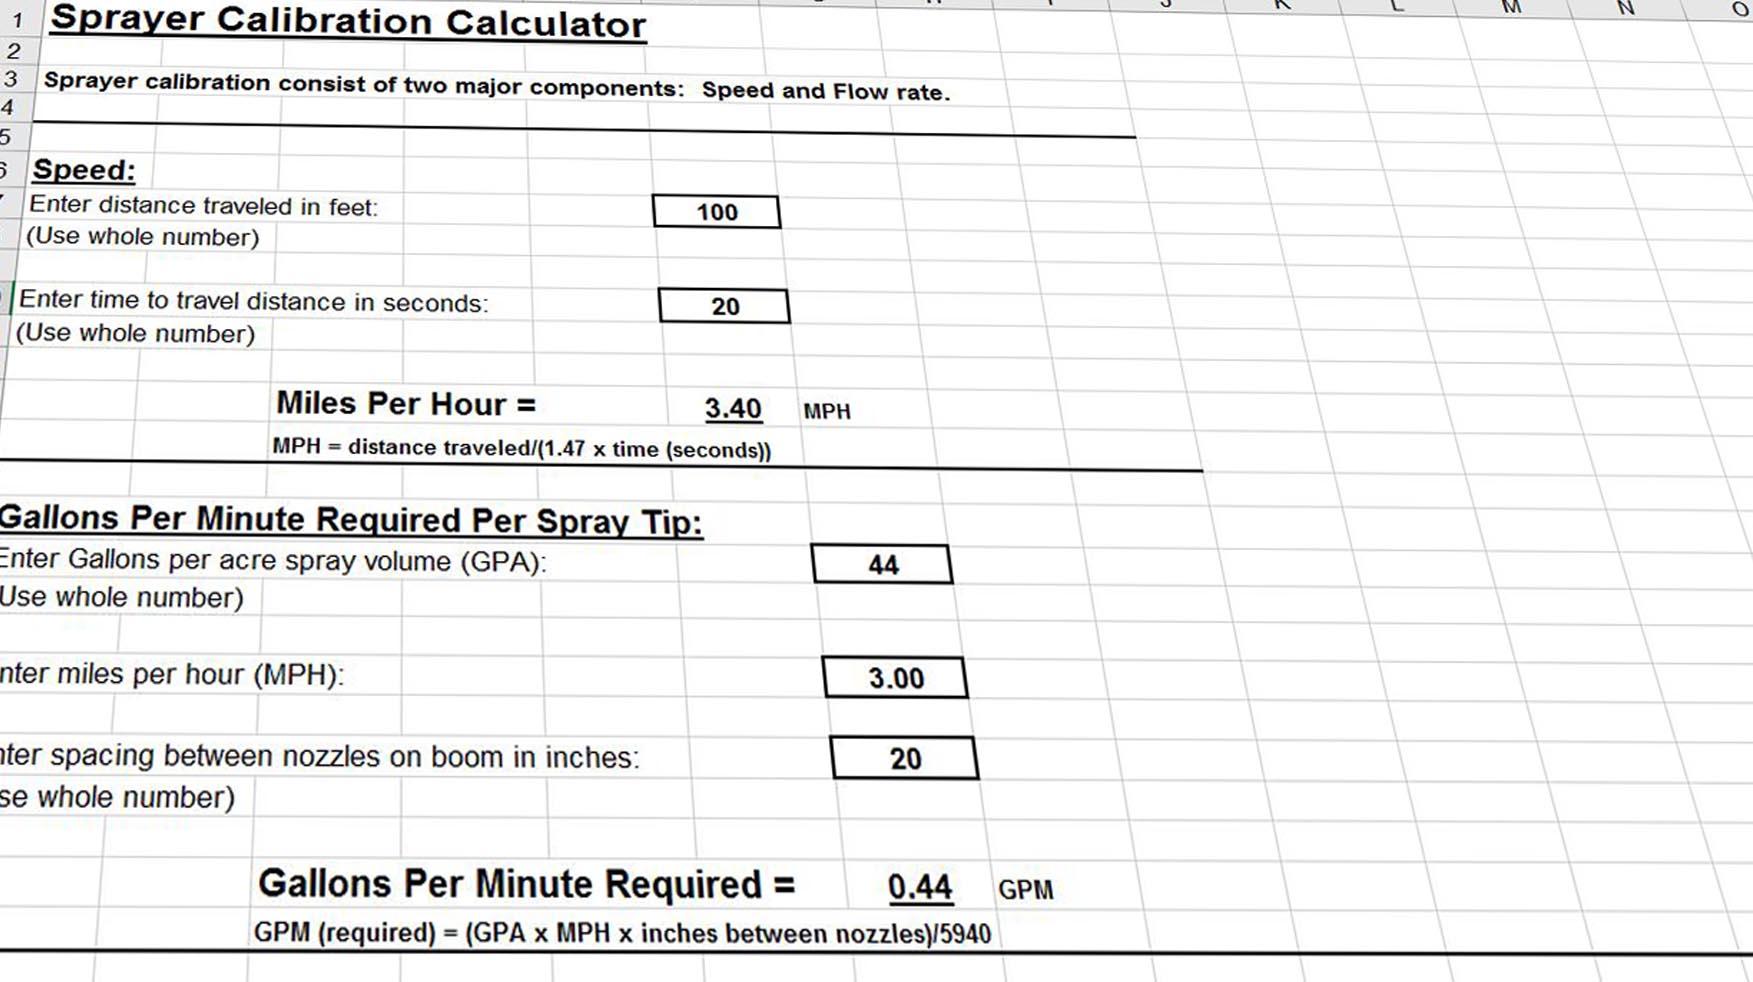 Worksheets Sprayer Calibration Worksheet calibrating a sprayer 4 of the best apps calculators and worksheets 7 jpg